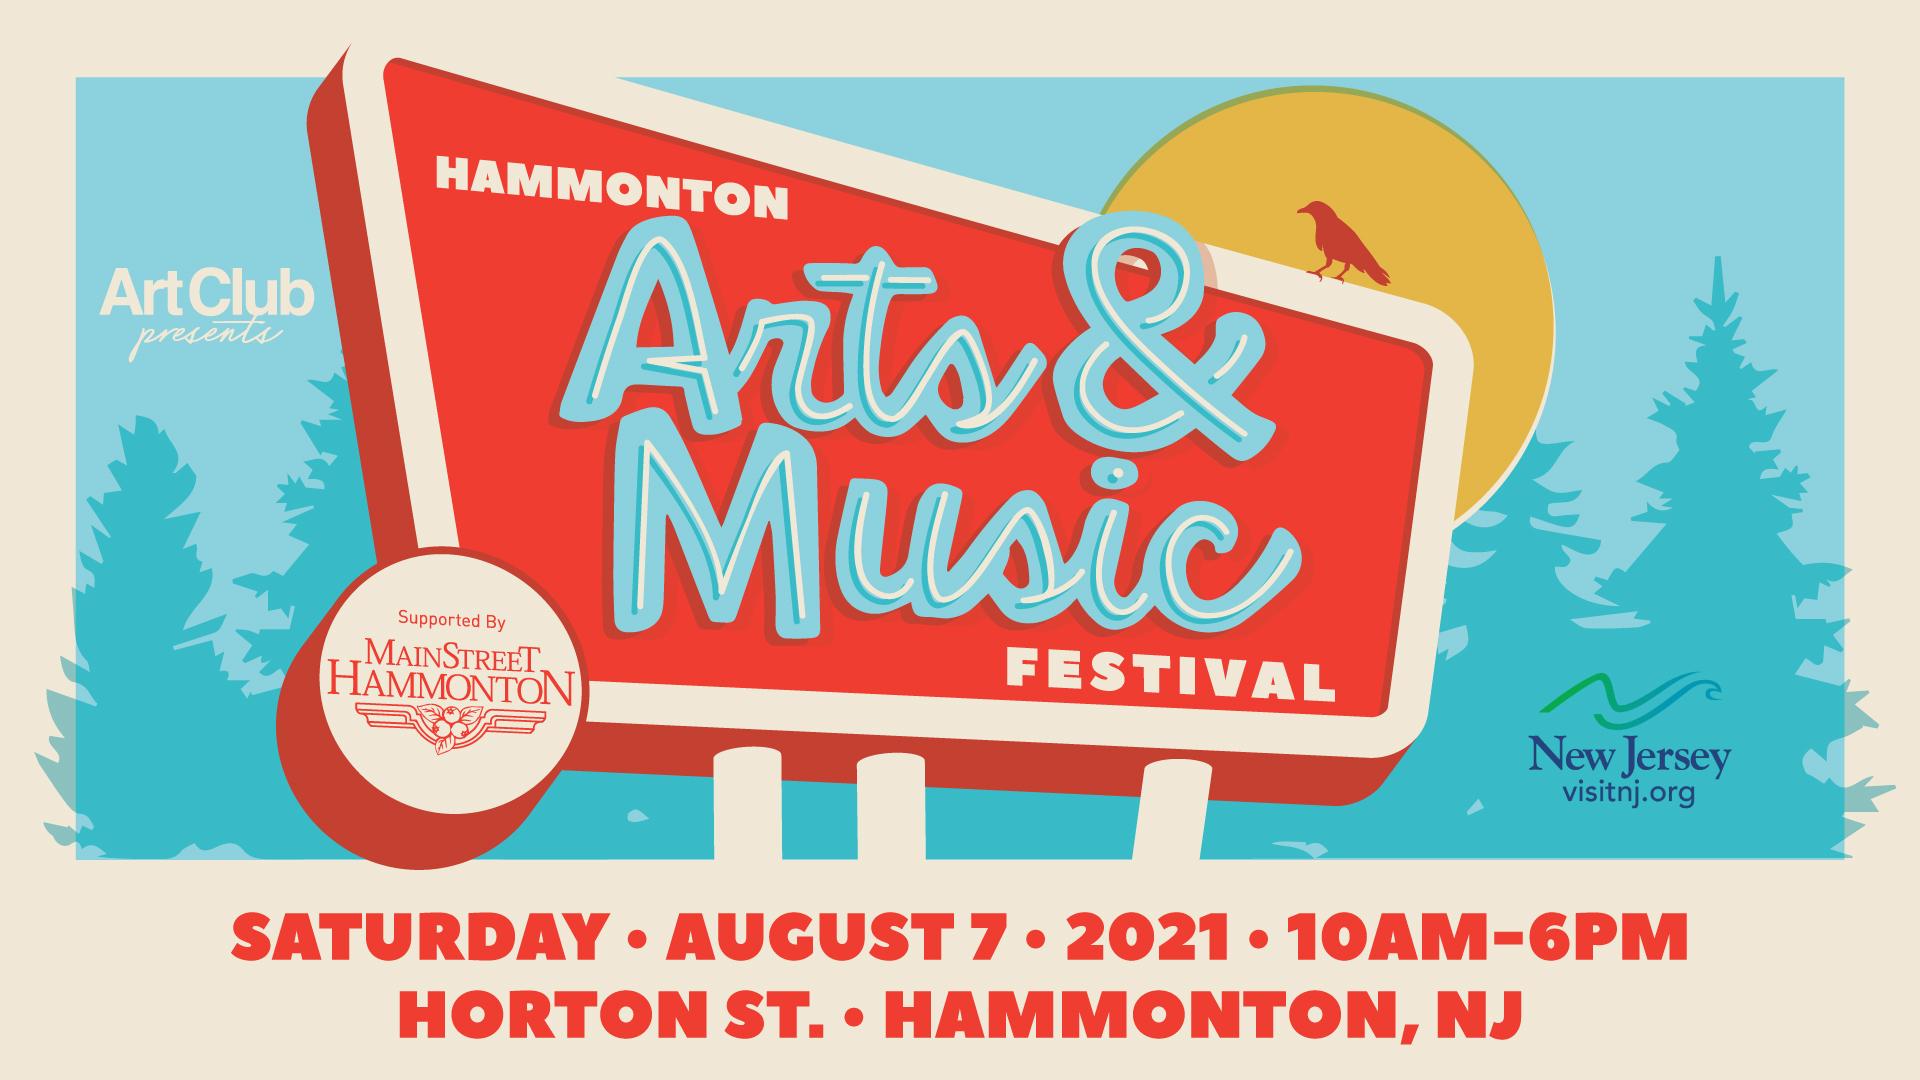 Hammonton Arts & Music Festival